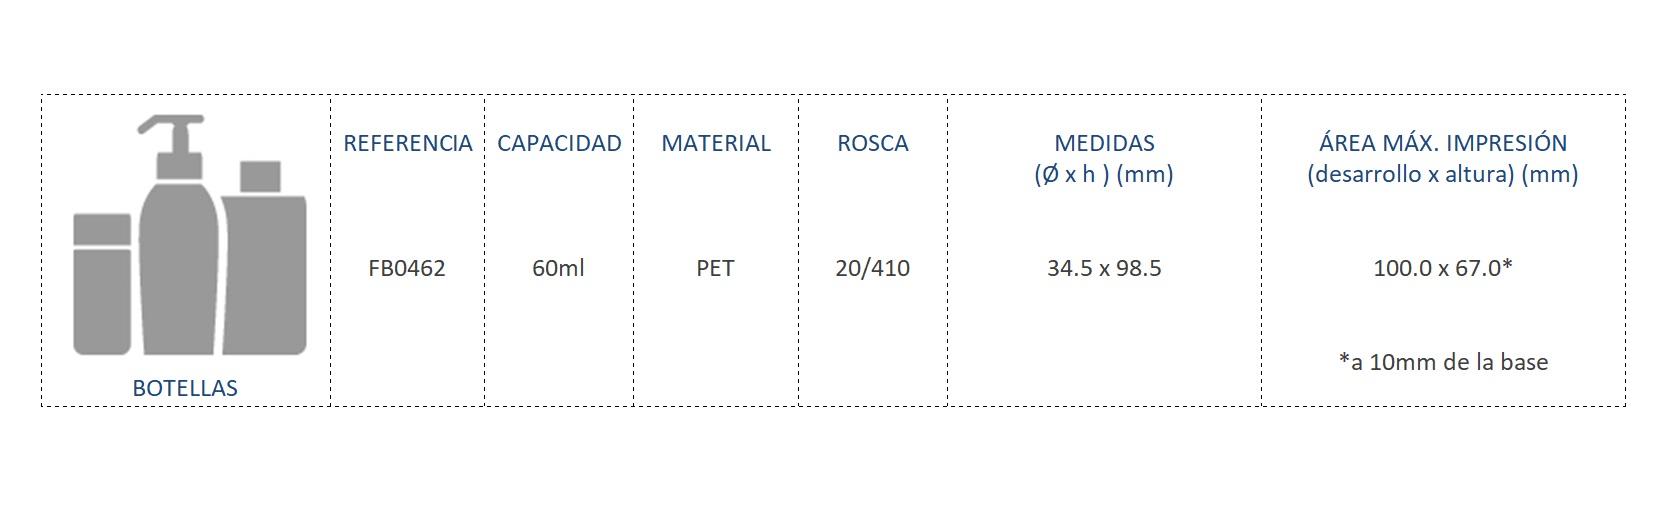 Cuadro de materiales FB0462